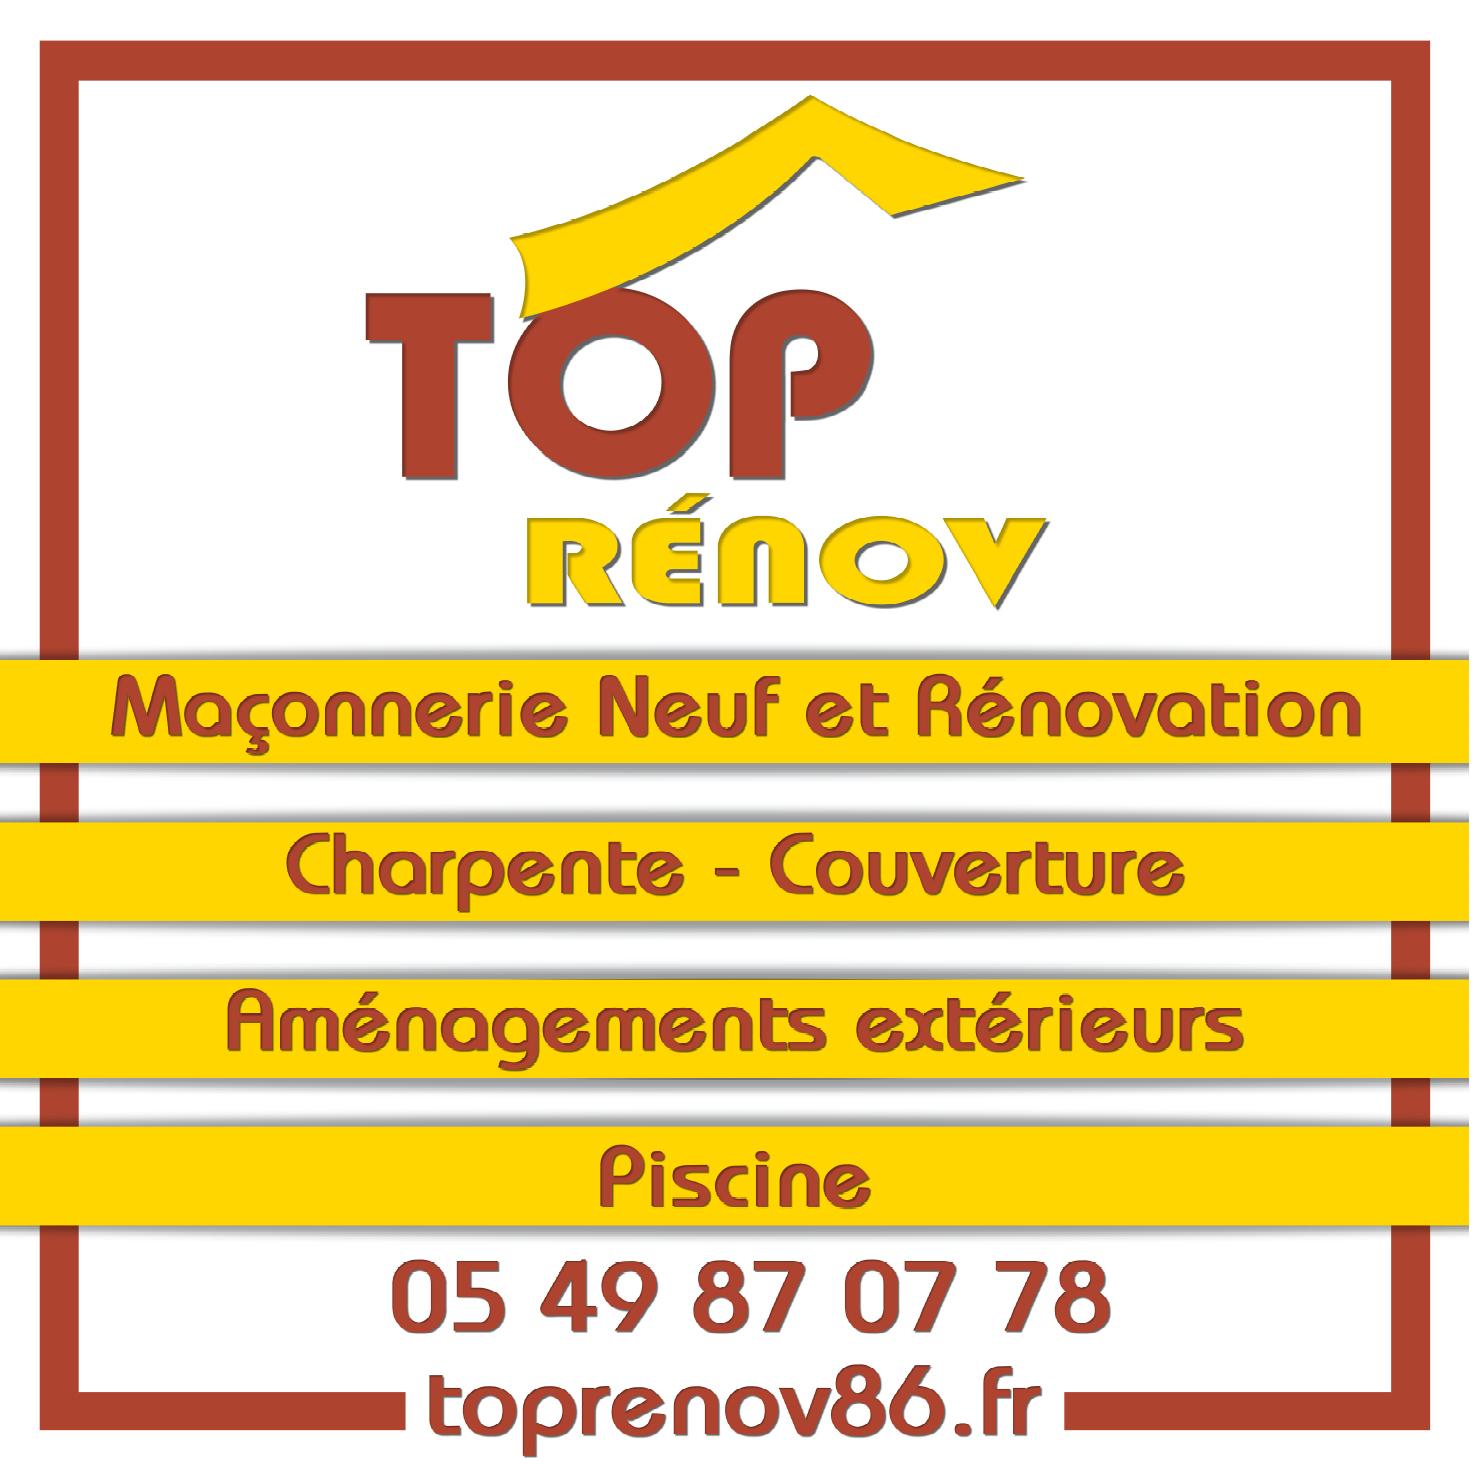 TOP RENOV